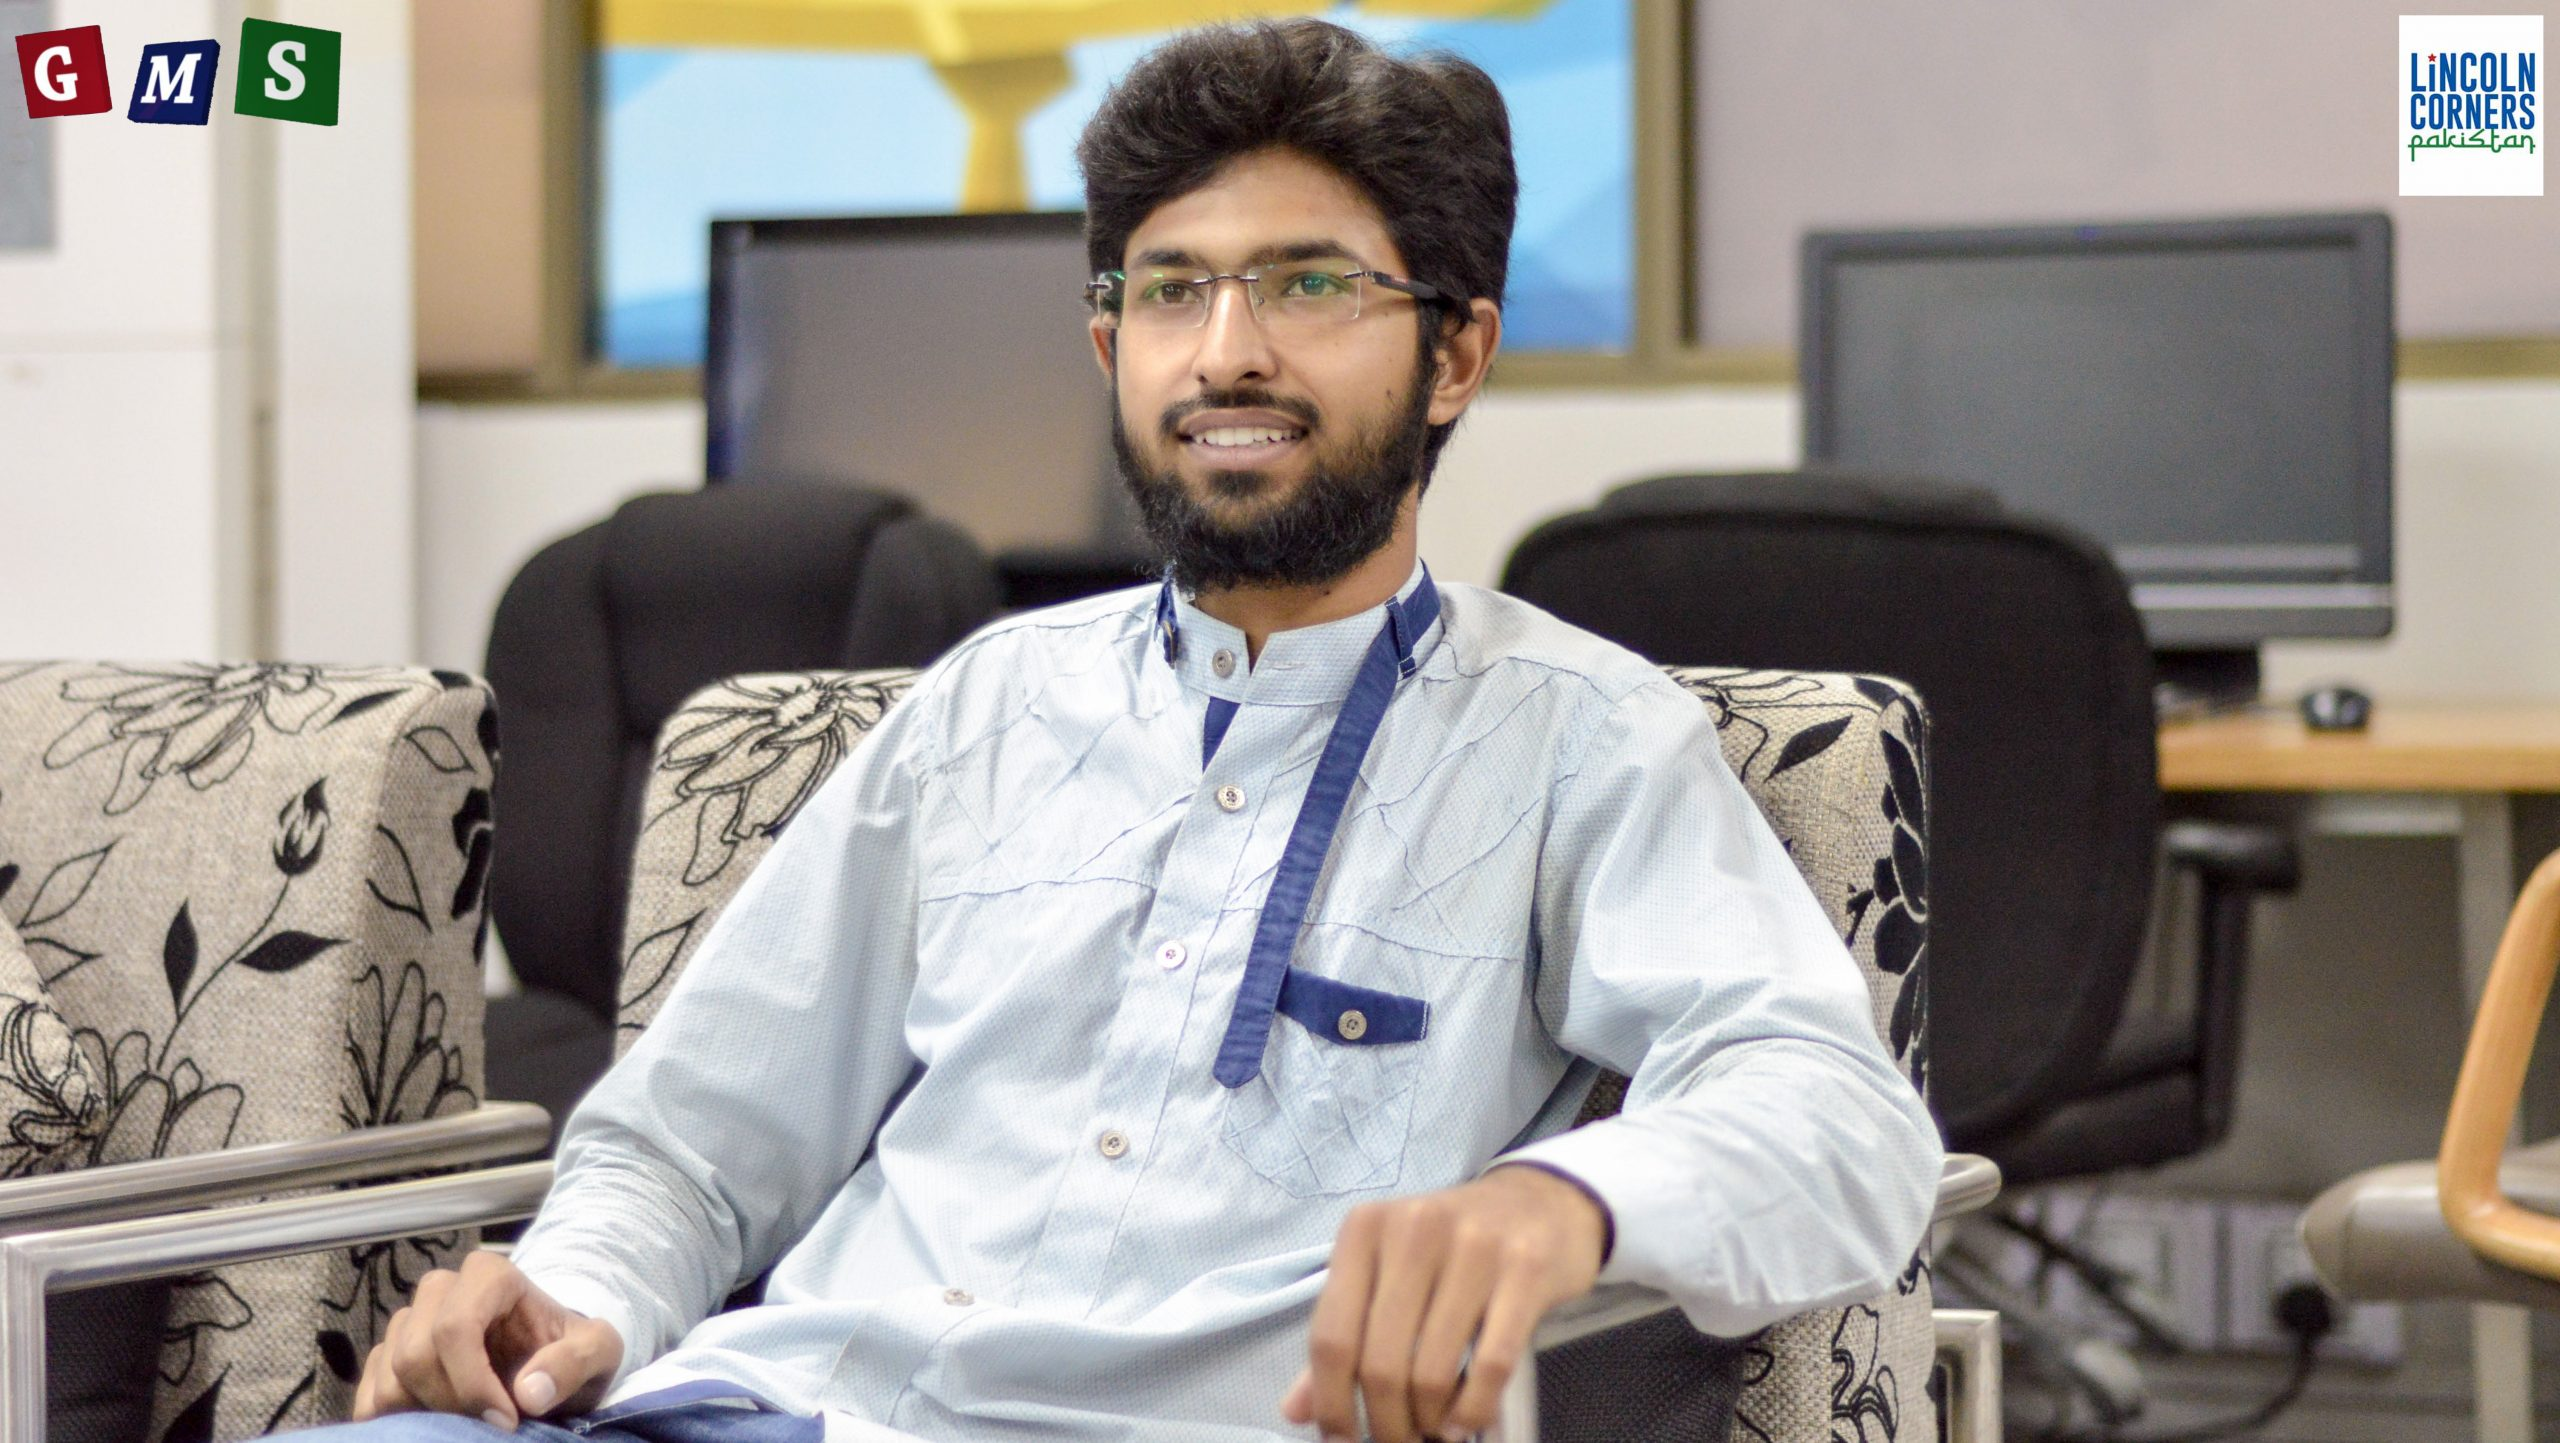 Talha Shoaib